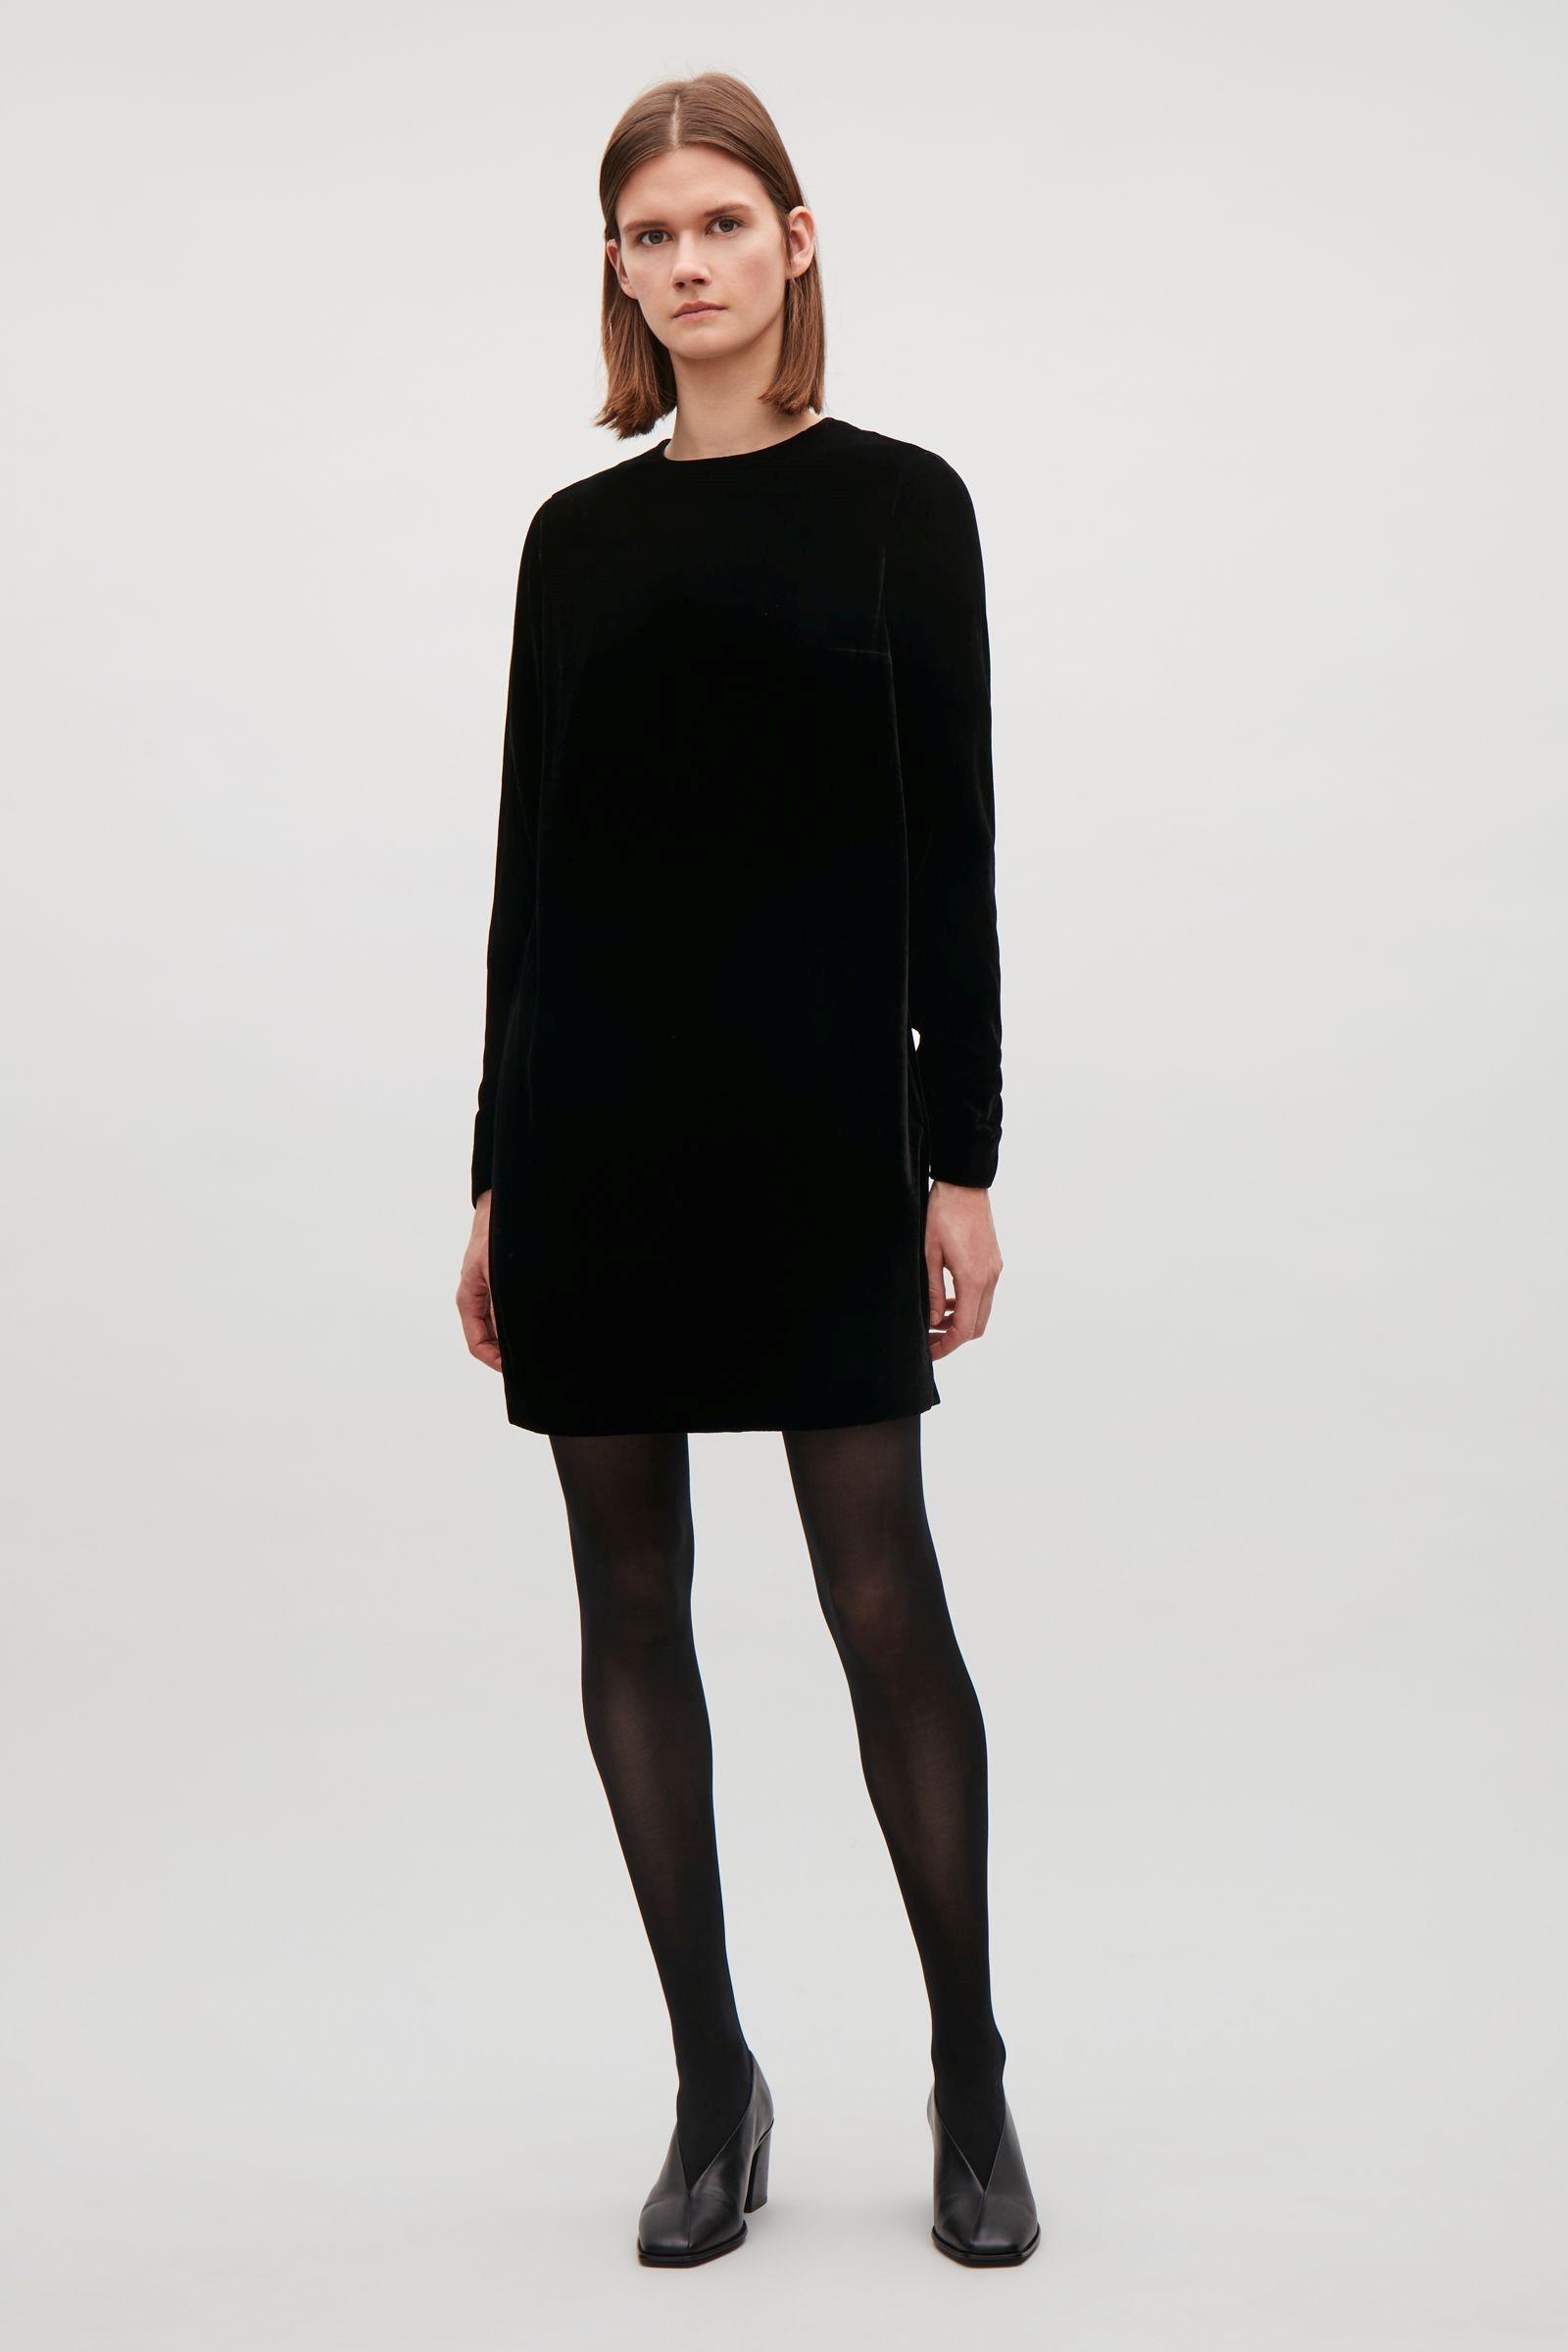 Cos image of velvet dress in black clergy couture pinterest